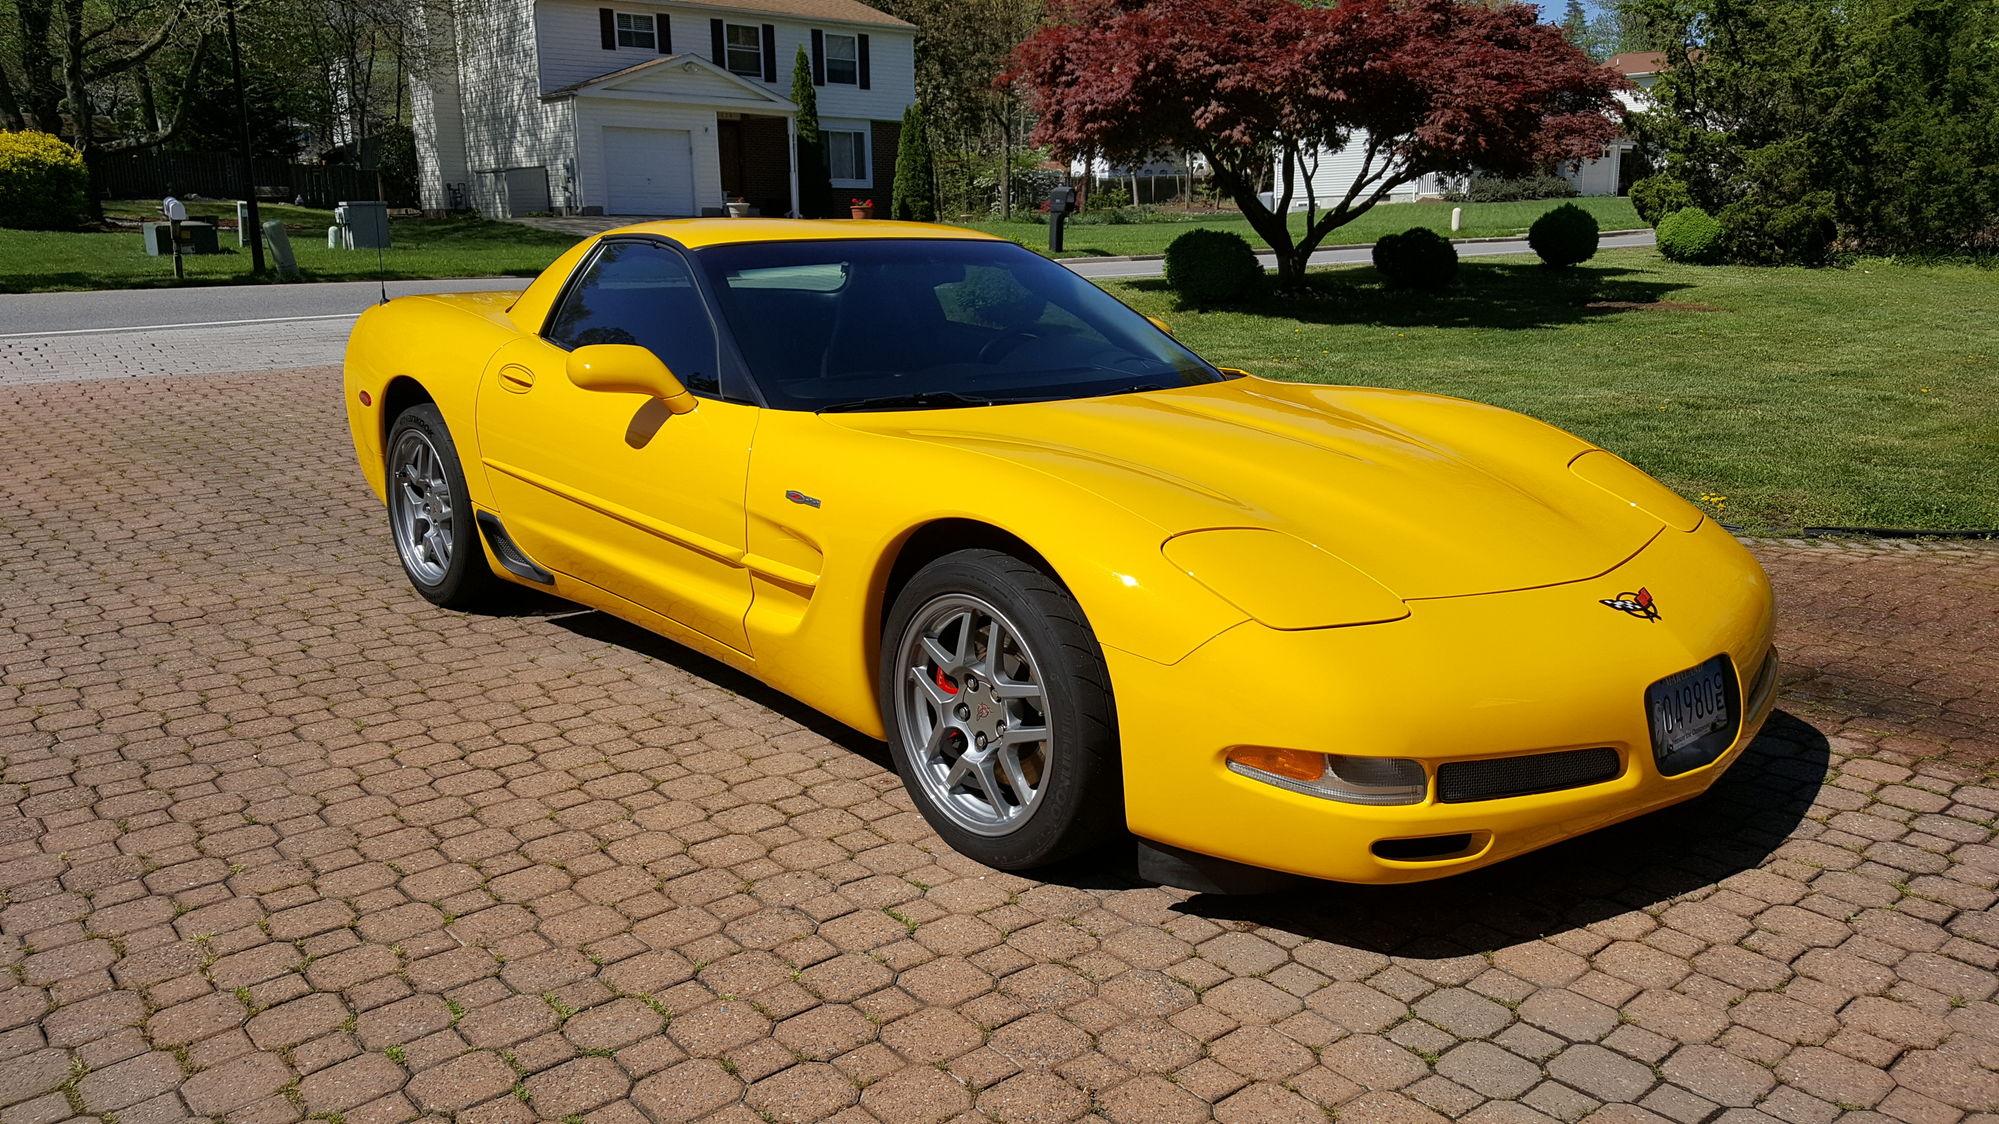 fs for sale 2004 corvette z06 corvetteforum chevrolet corvette forum discussion. Black Bedroom Furniture Sets. Home Design Ideas